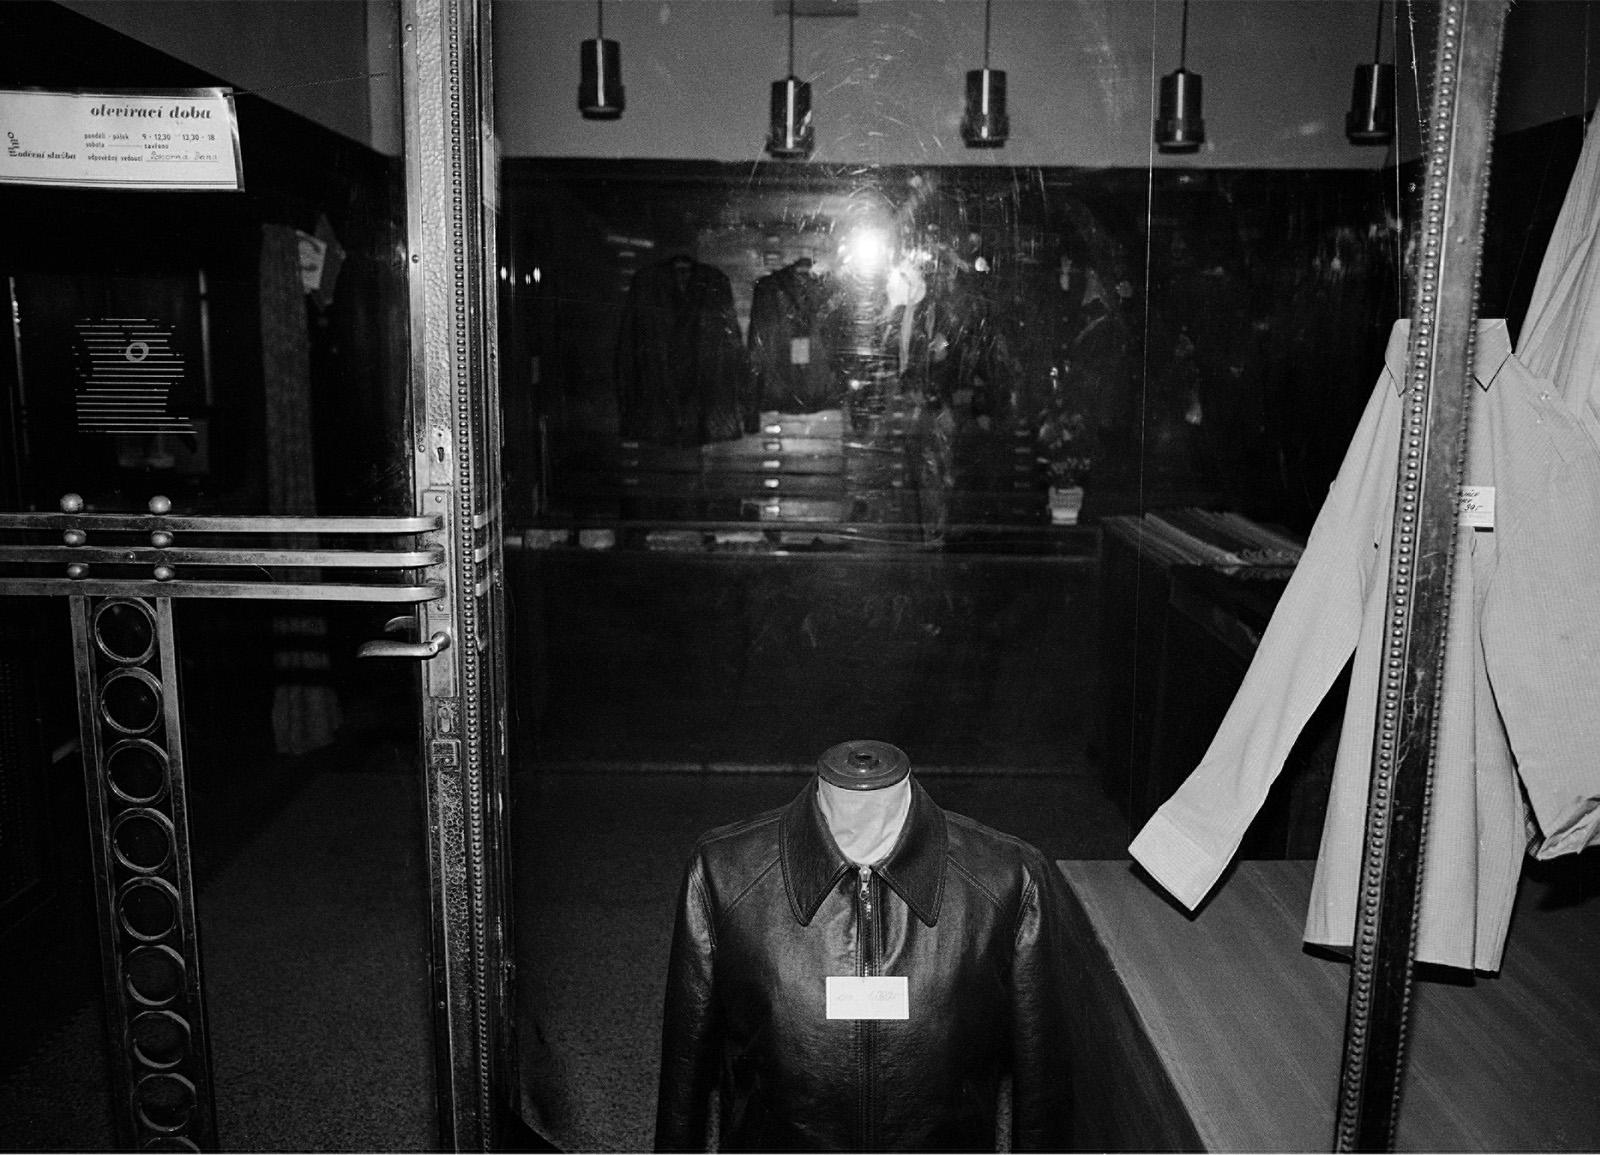 PAMĚTI NOCI – PRAHA 1983 / NIGHT MEMORIES – PRAGUE 1983 © PETER ŽUPNÍK: Bezhlavý pozorovatel / Headless Observer